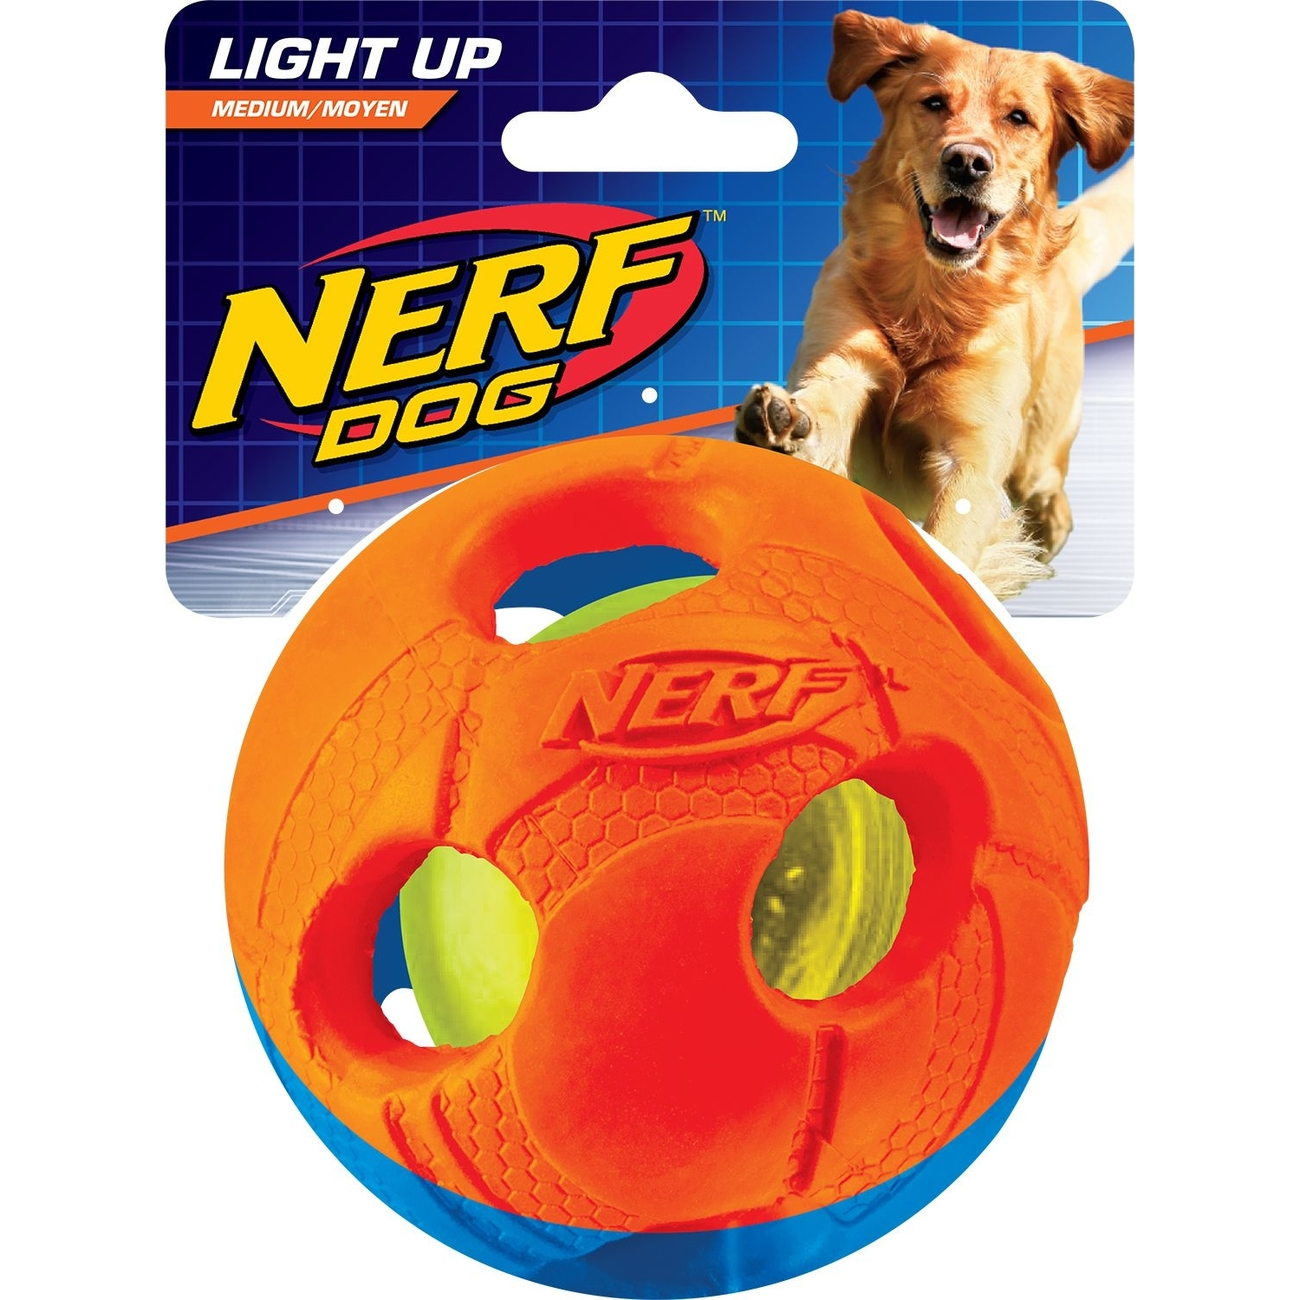 NERF Dog lluma-Action LED für Hunde, Bild 2